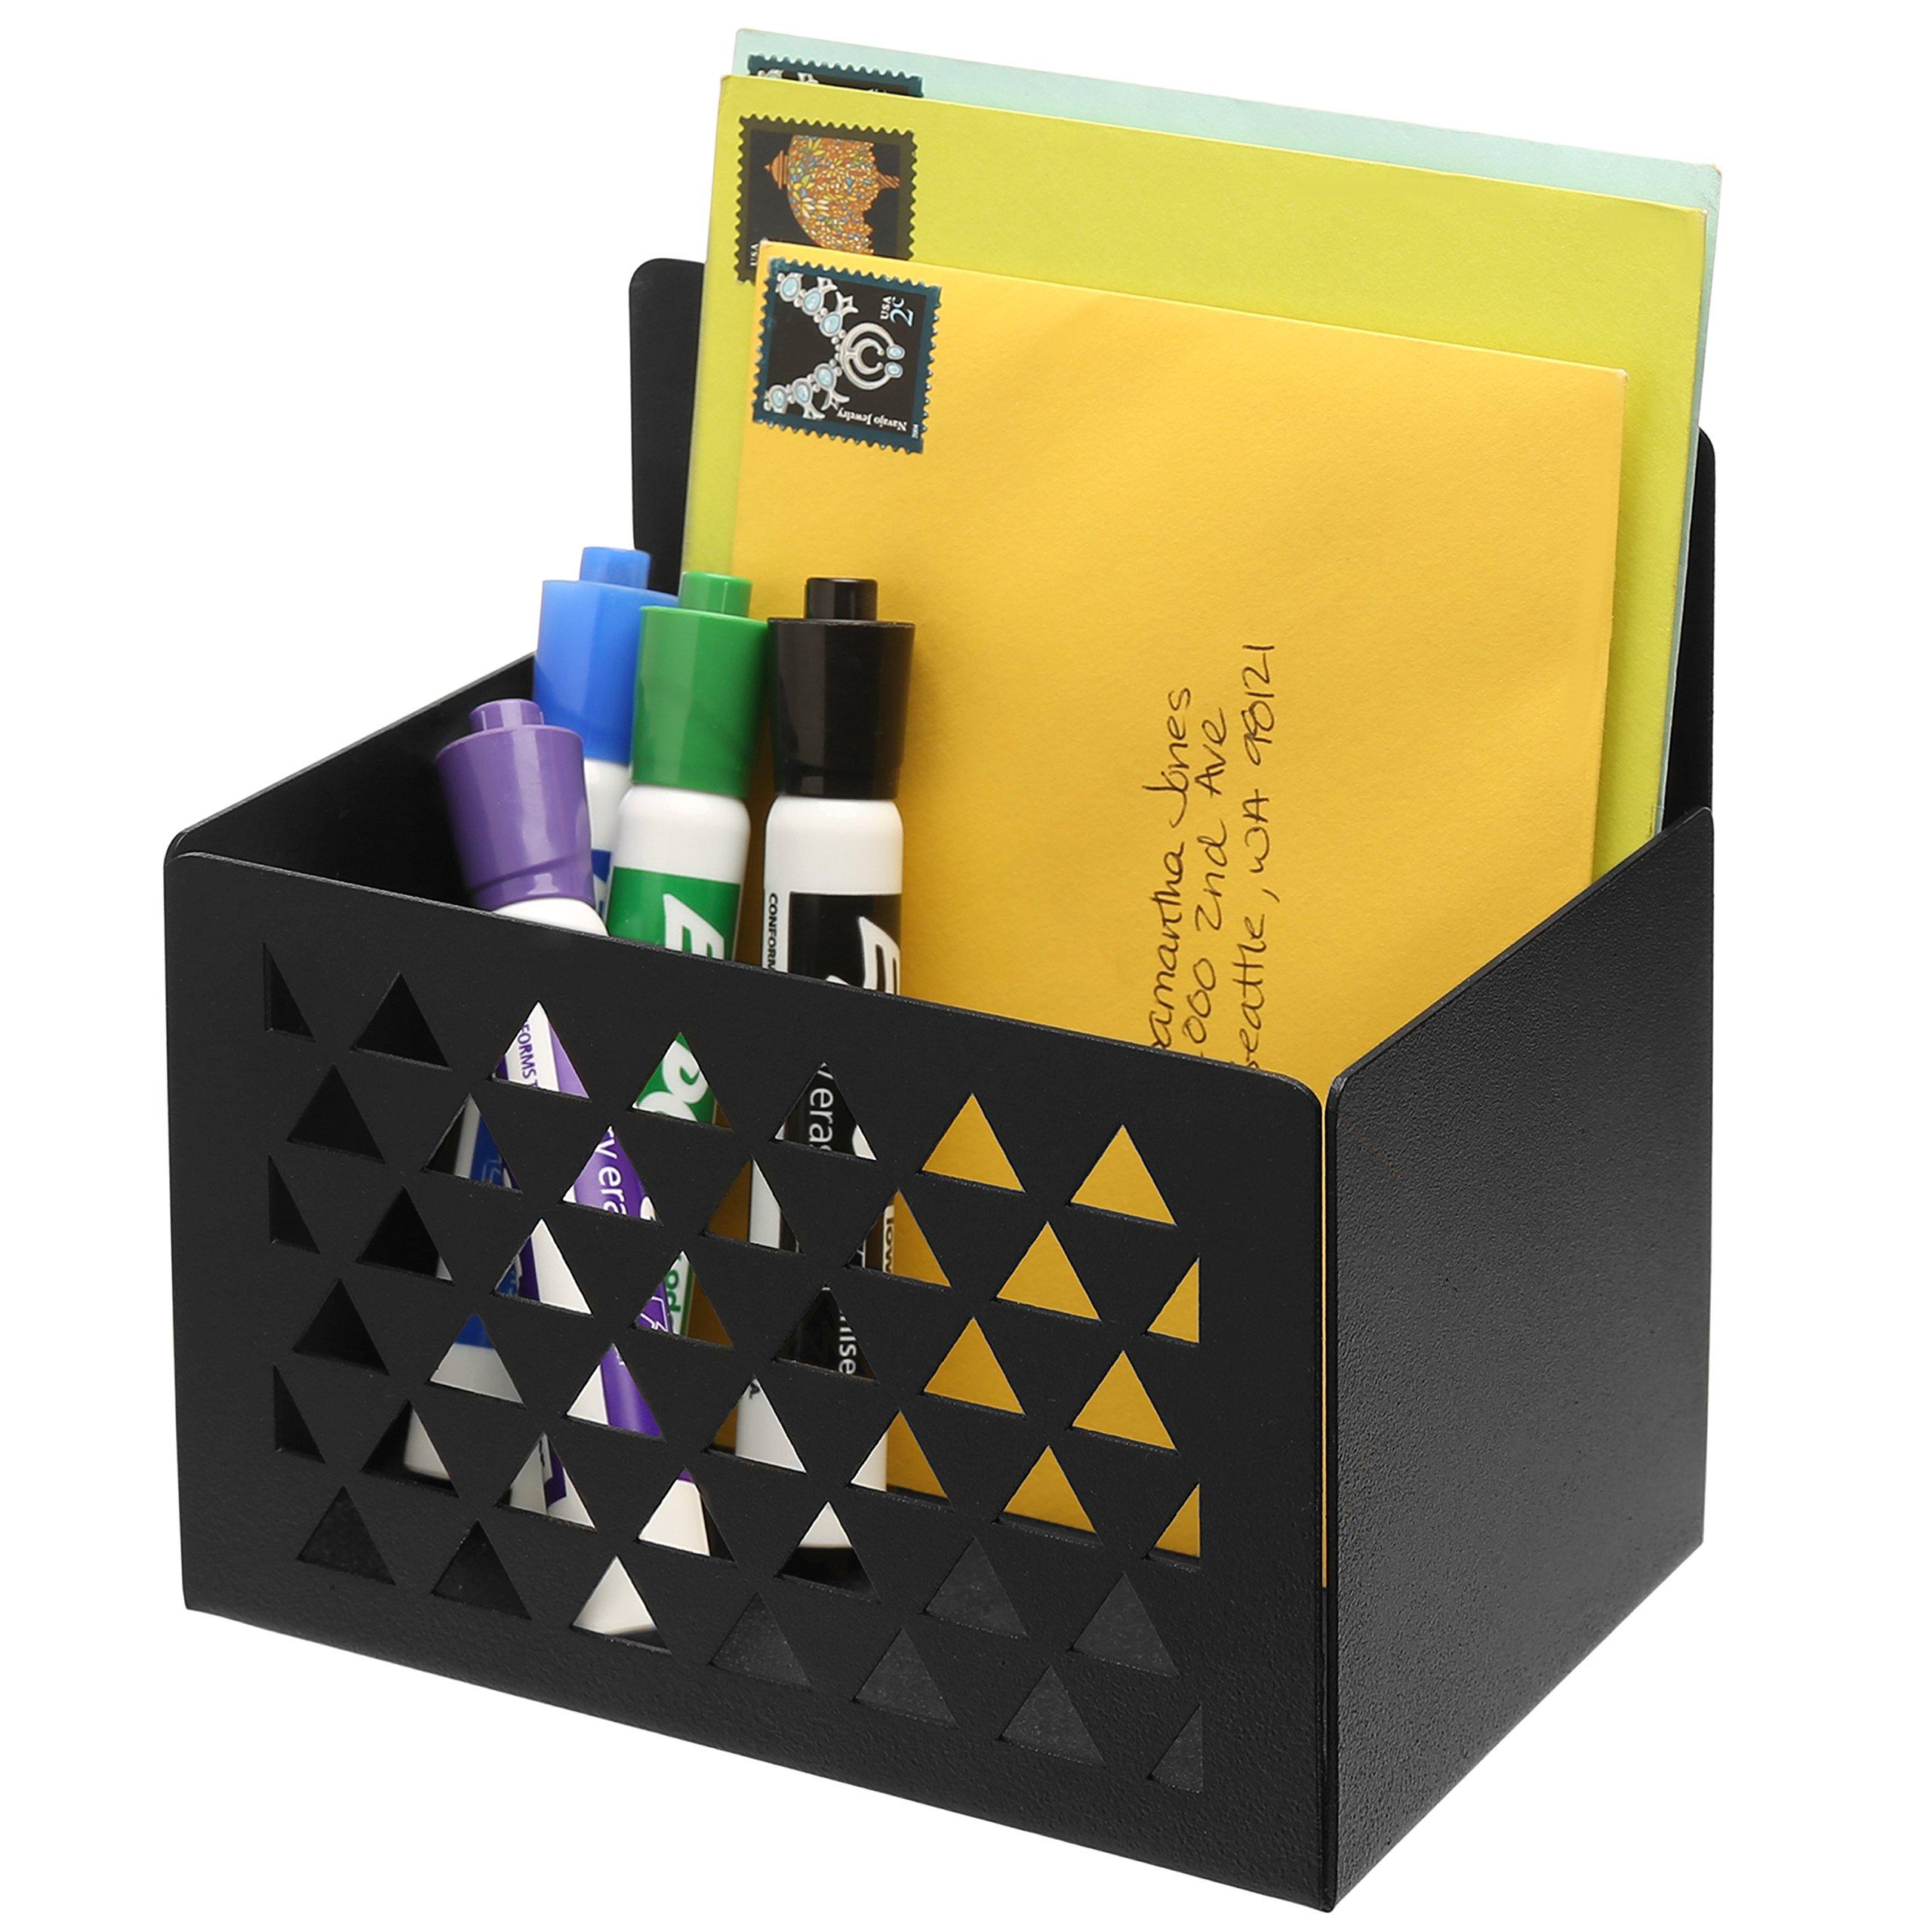 MyGift Wall-Mounted Laser-Cut Metal Storage Bin, Office Organizer & Mail Holder, Black